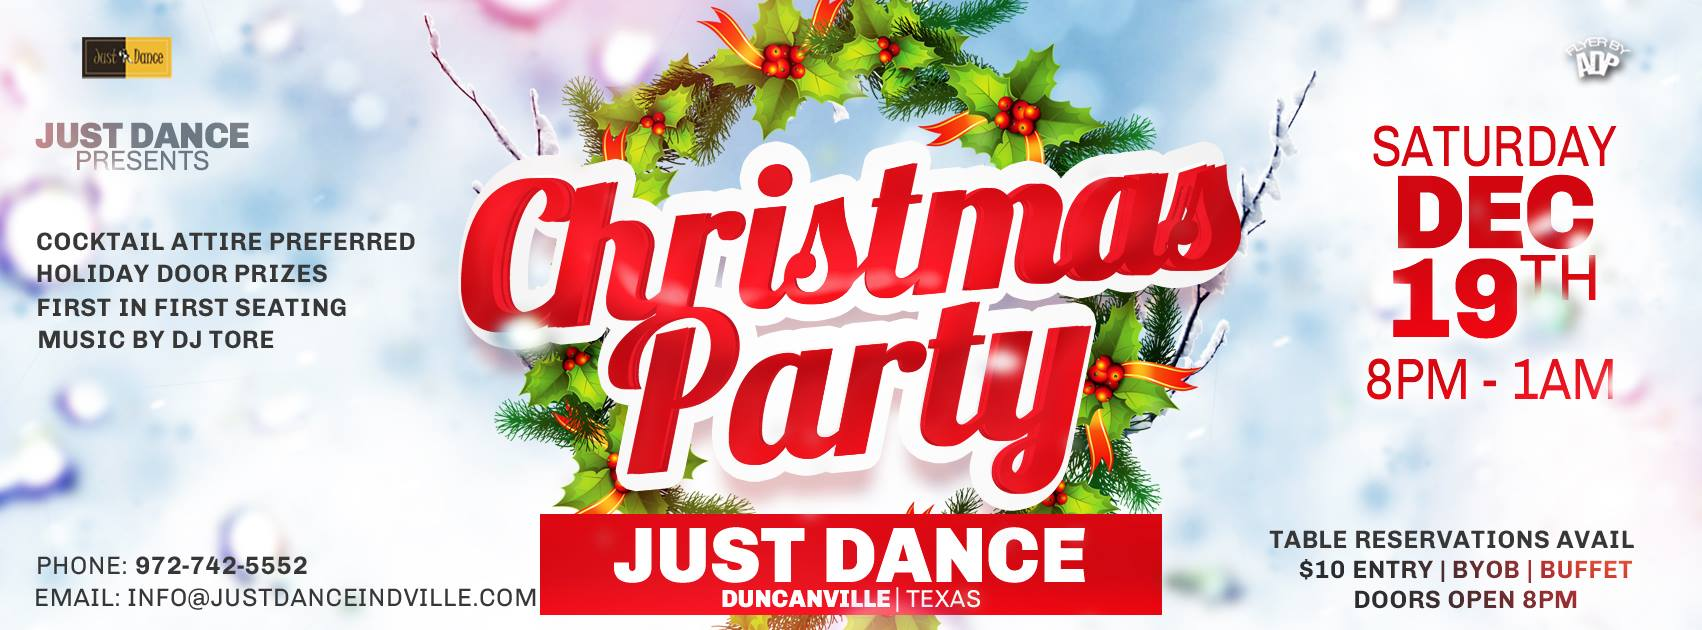 Just Dance Christmas Party – Duncanville, TX » DFW Swing Dance